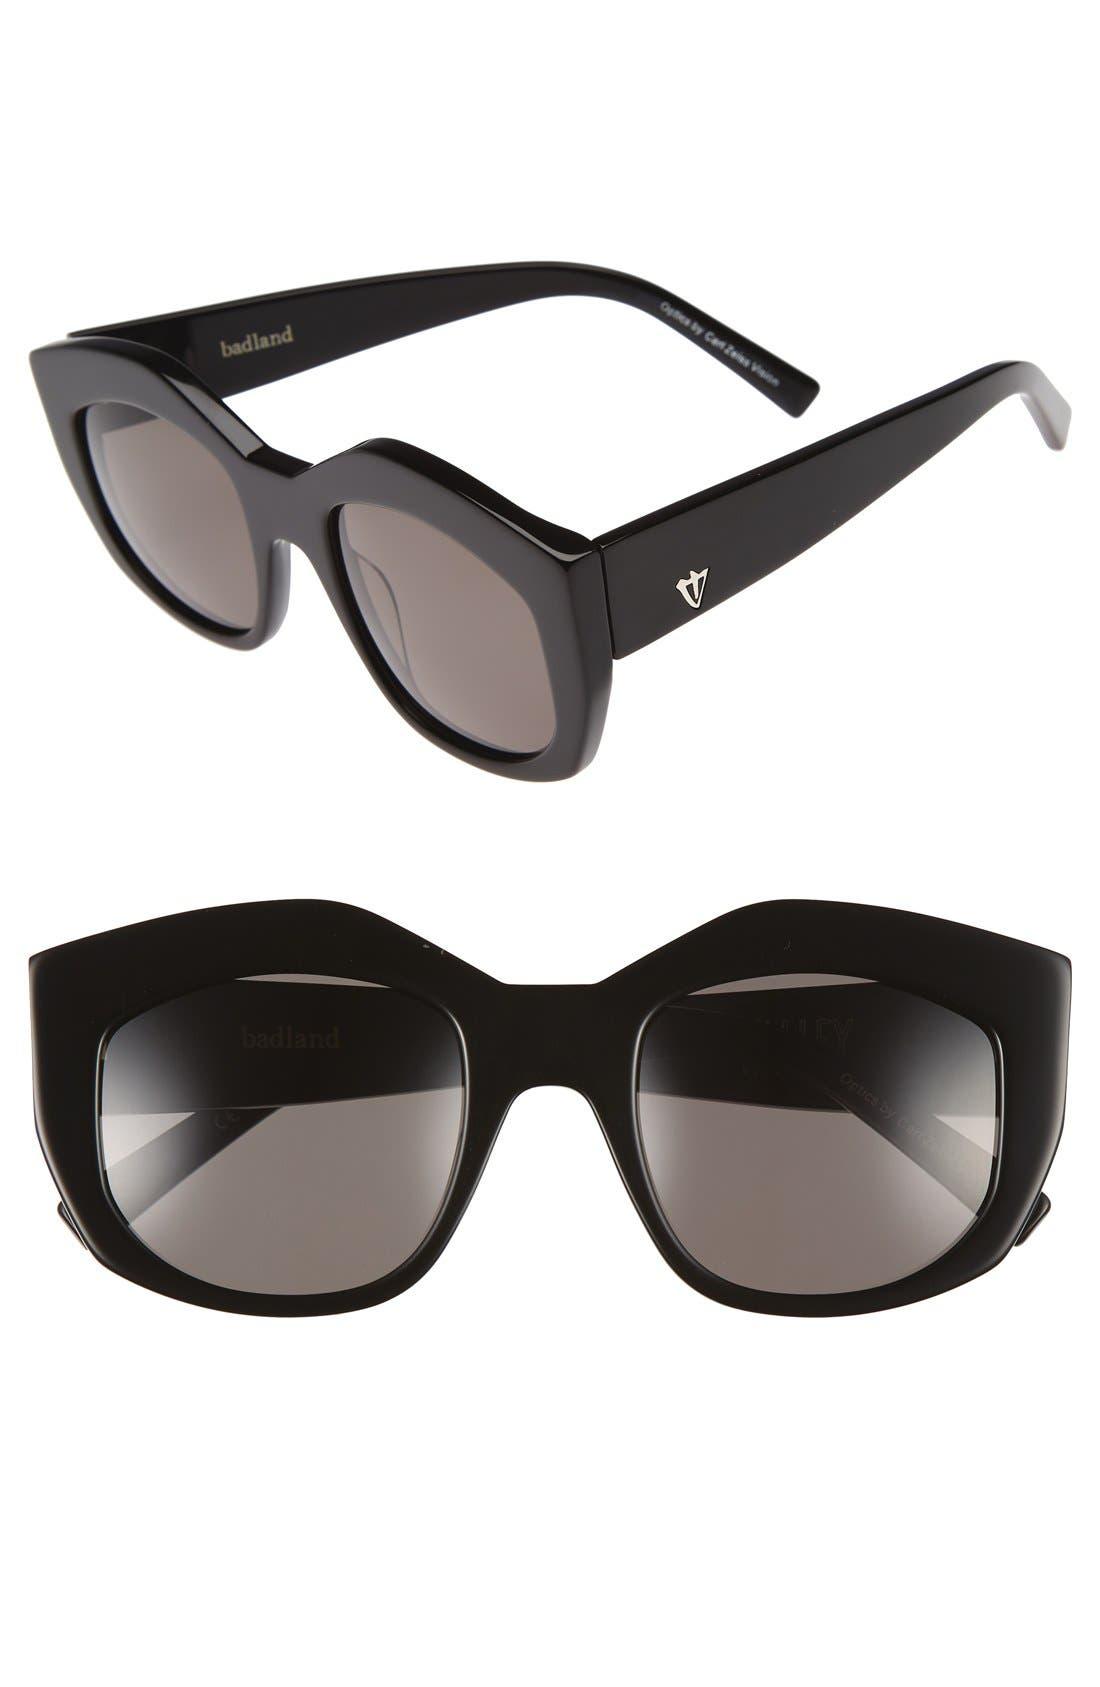 VALLEY 50mm Badland Sunglasses